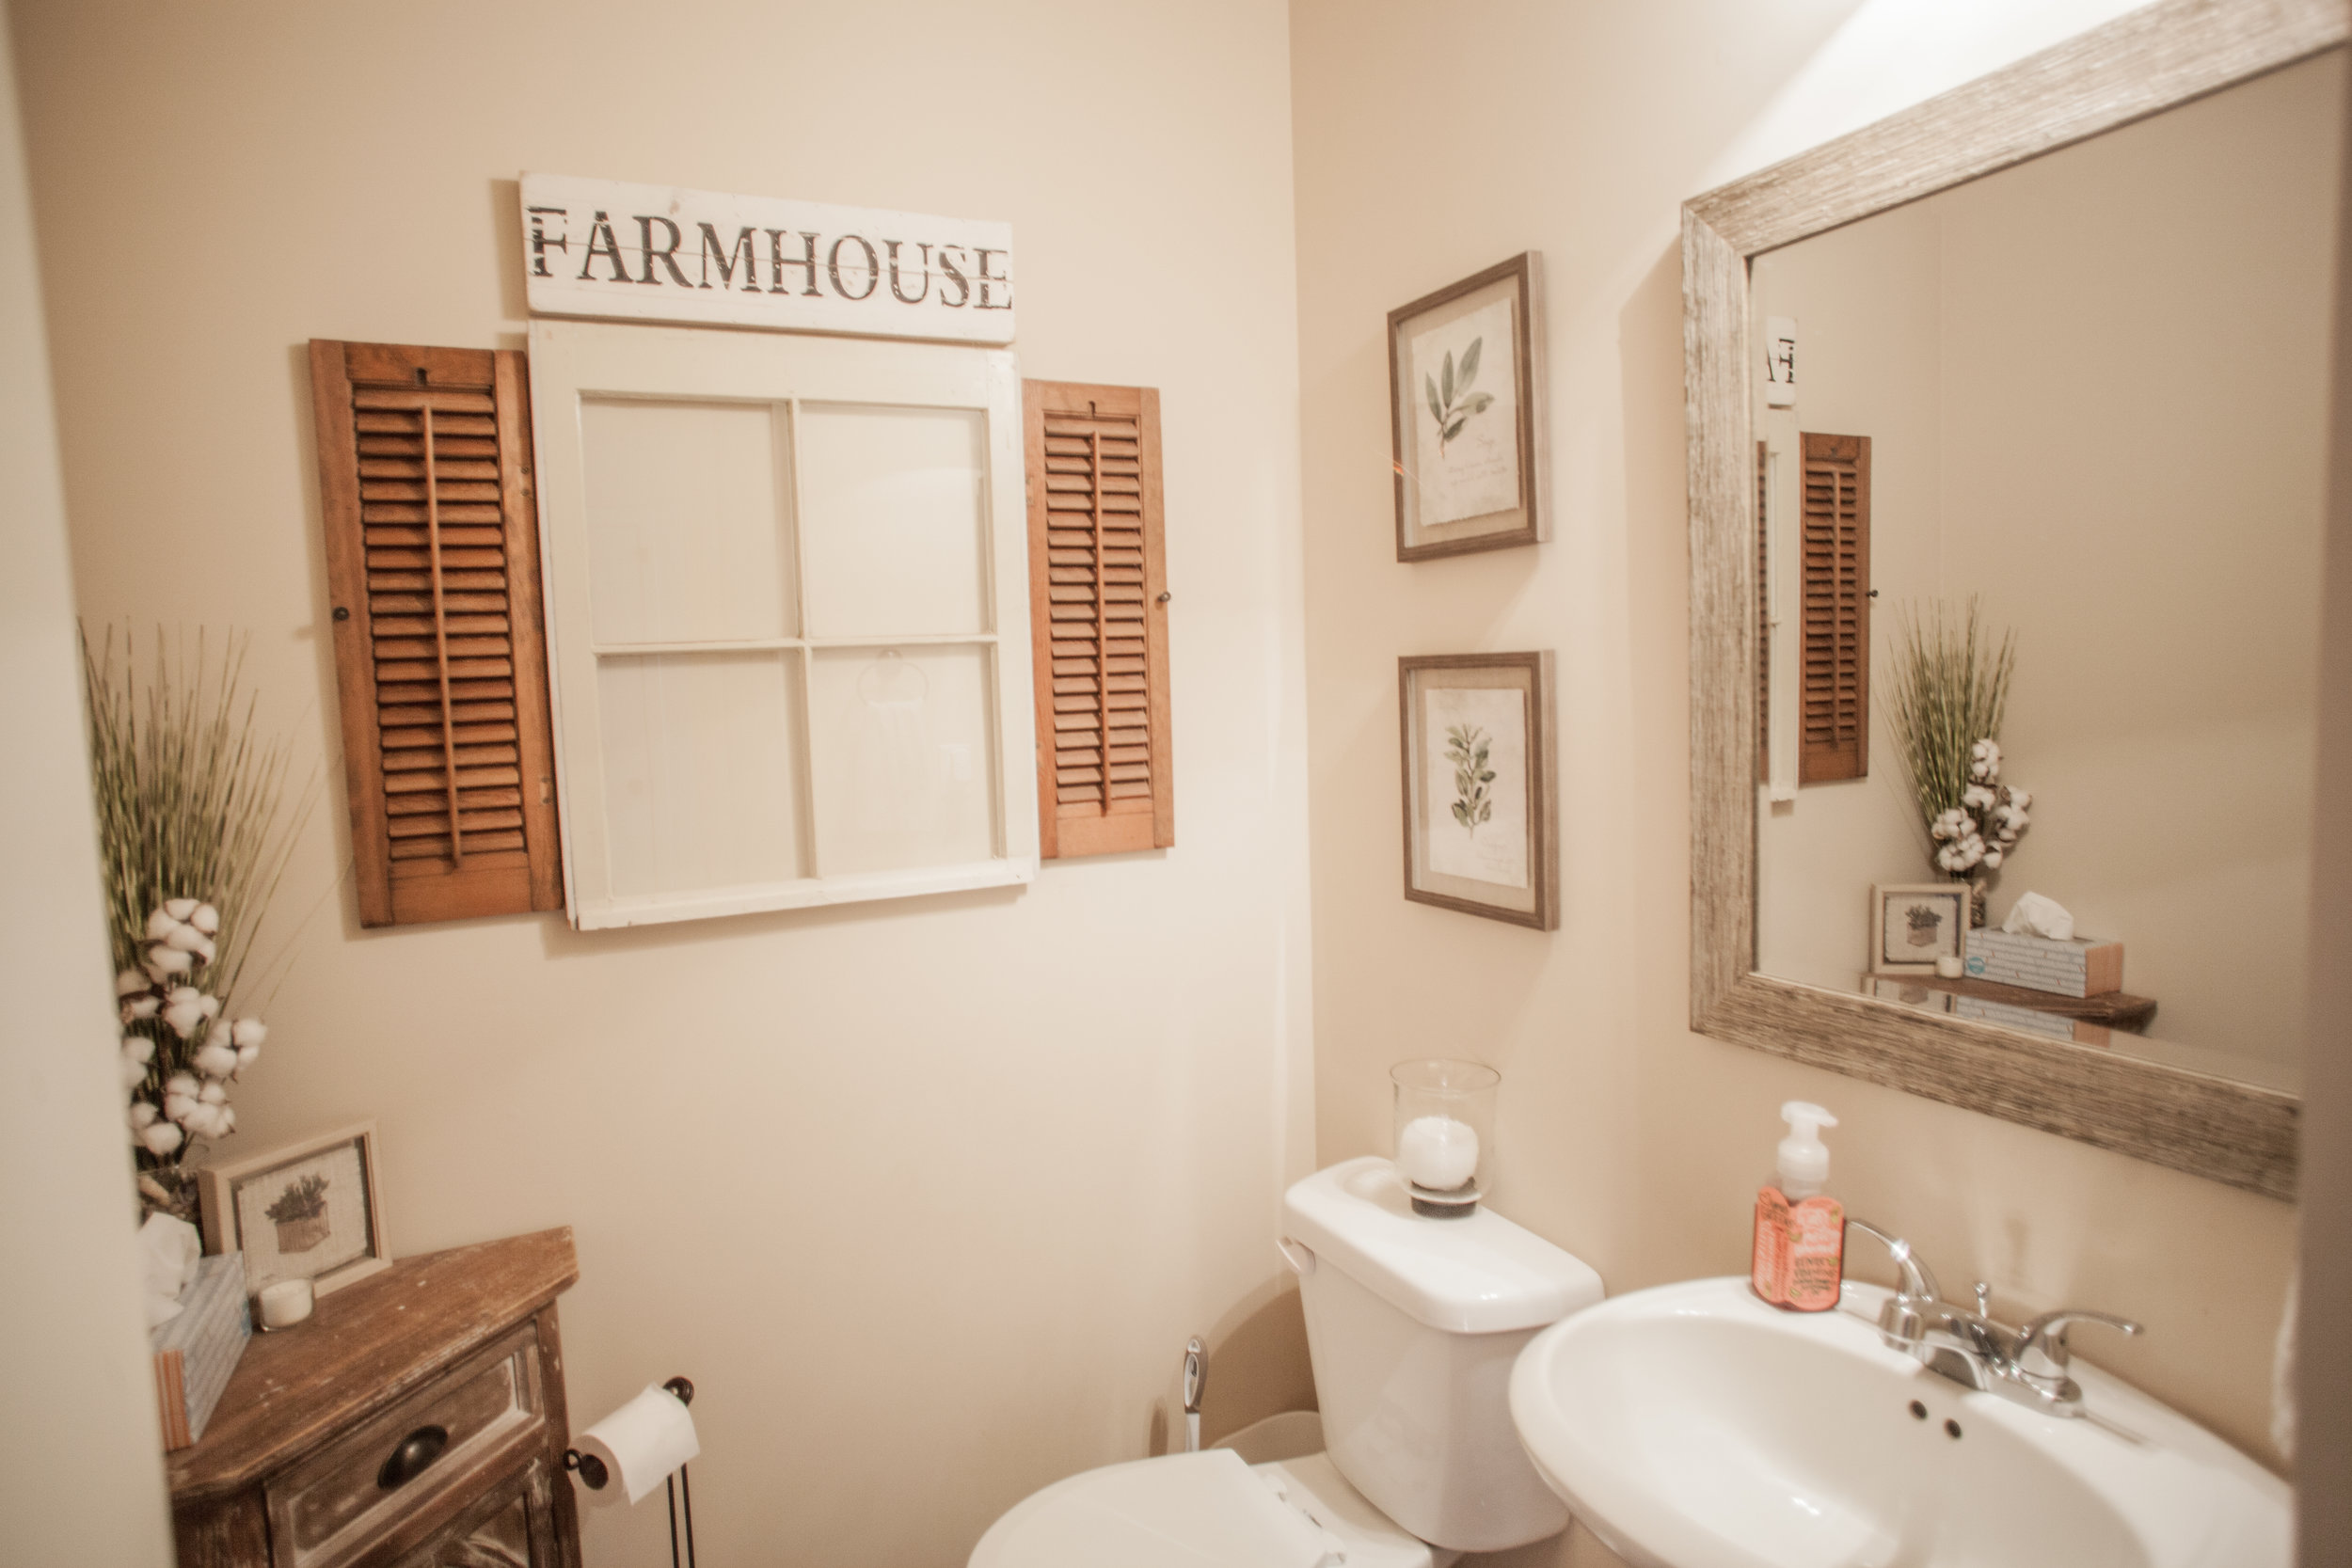 woodstock-ga-house-for-sale-wingard-real-estate-under-300k-37.jpg